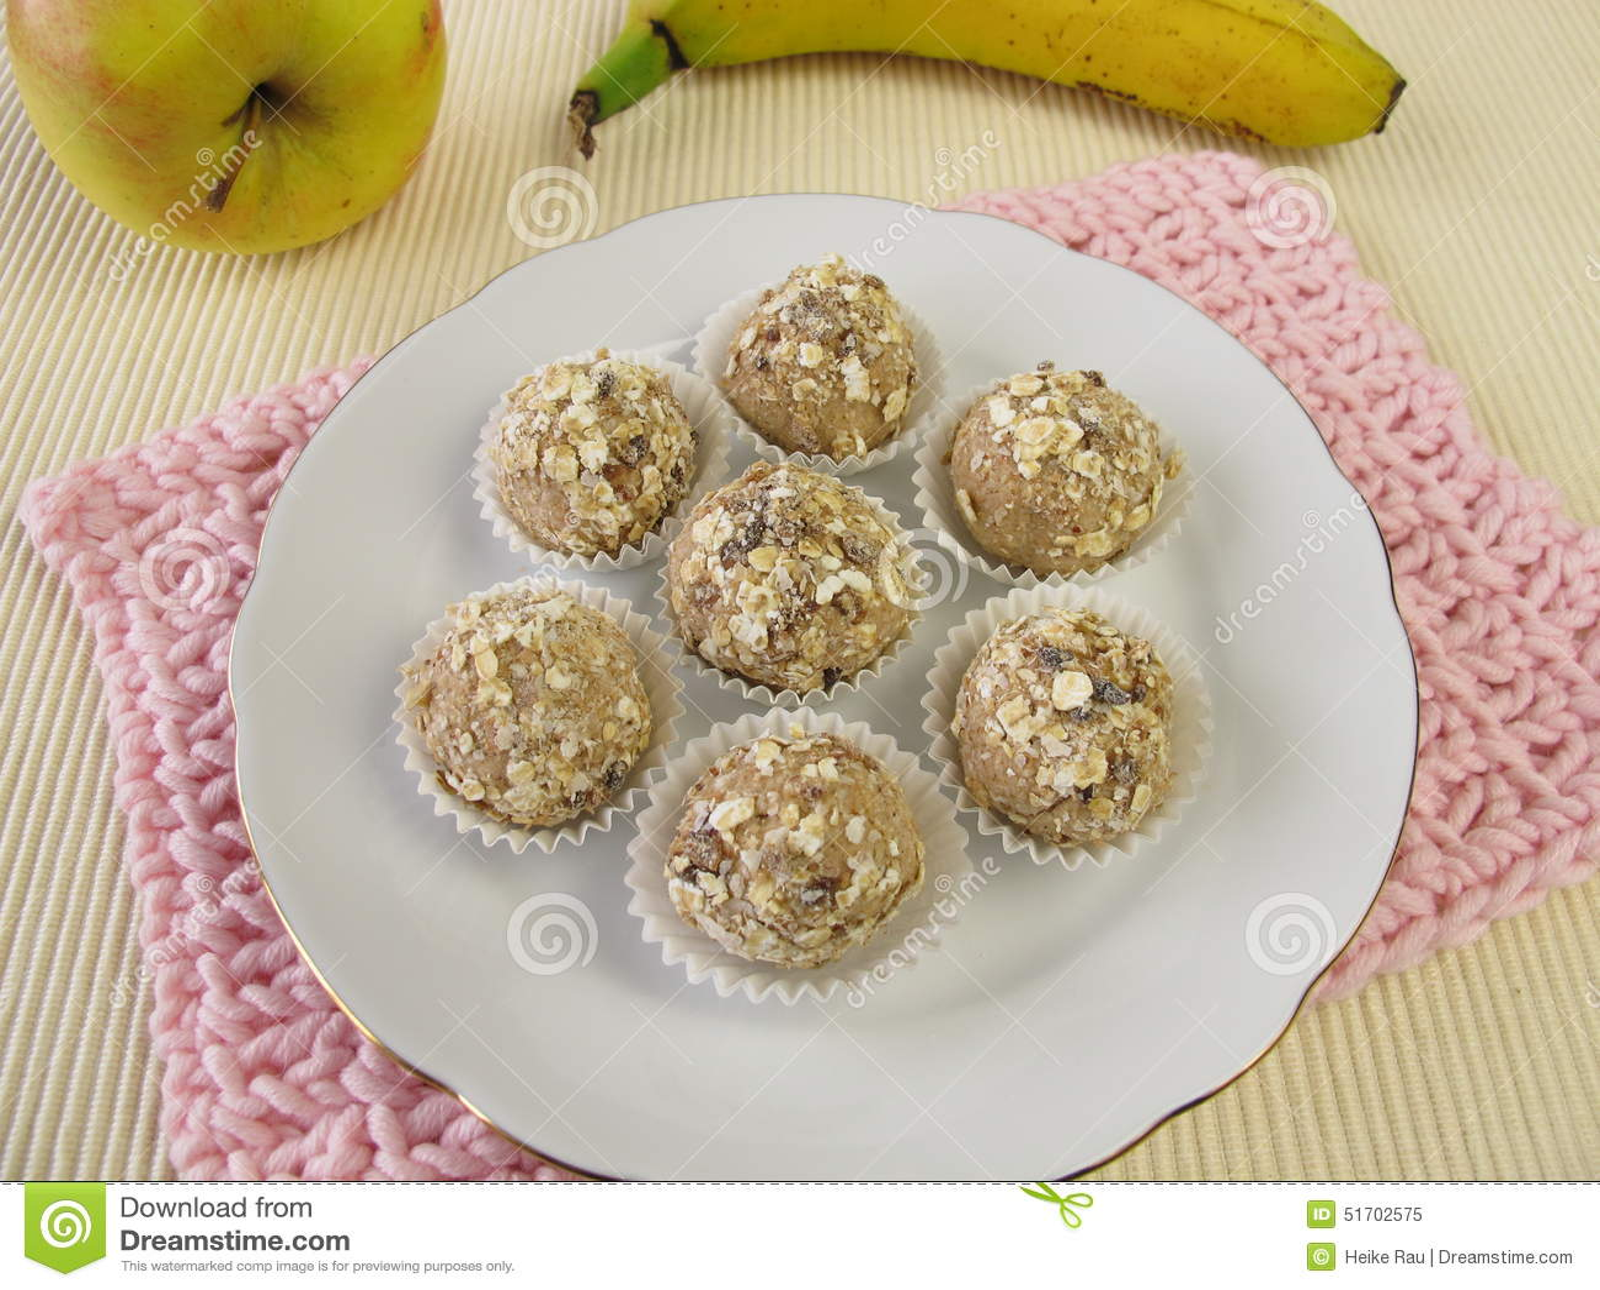 Energy balls from roasted barley flour